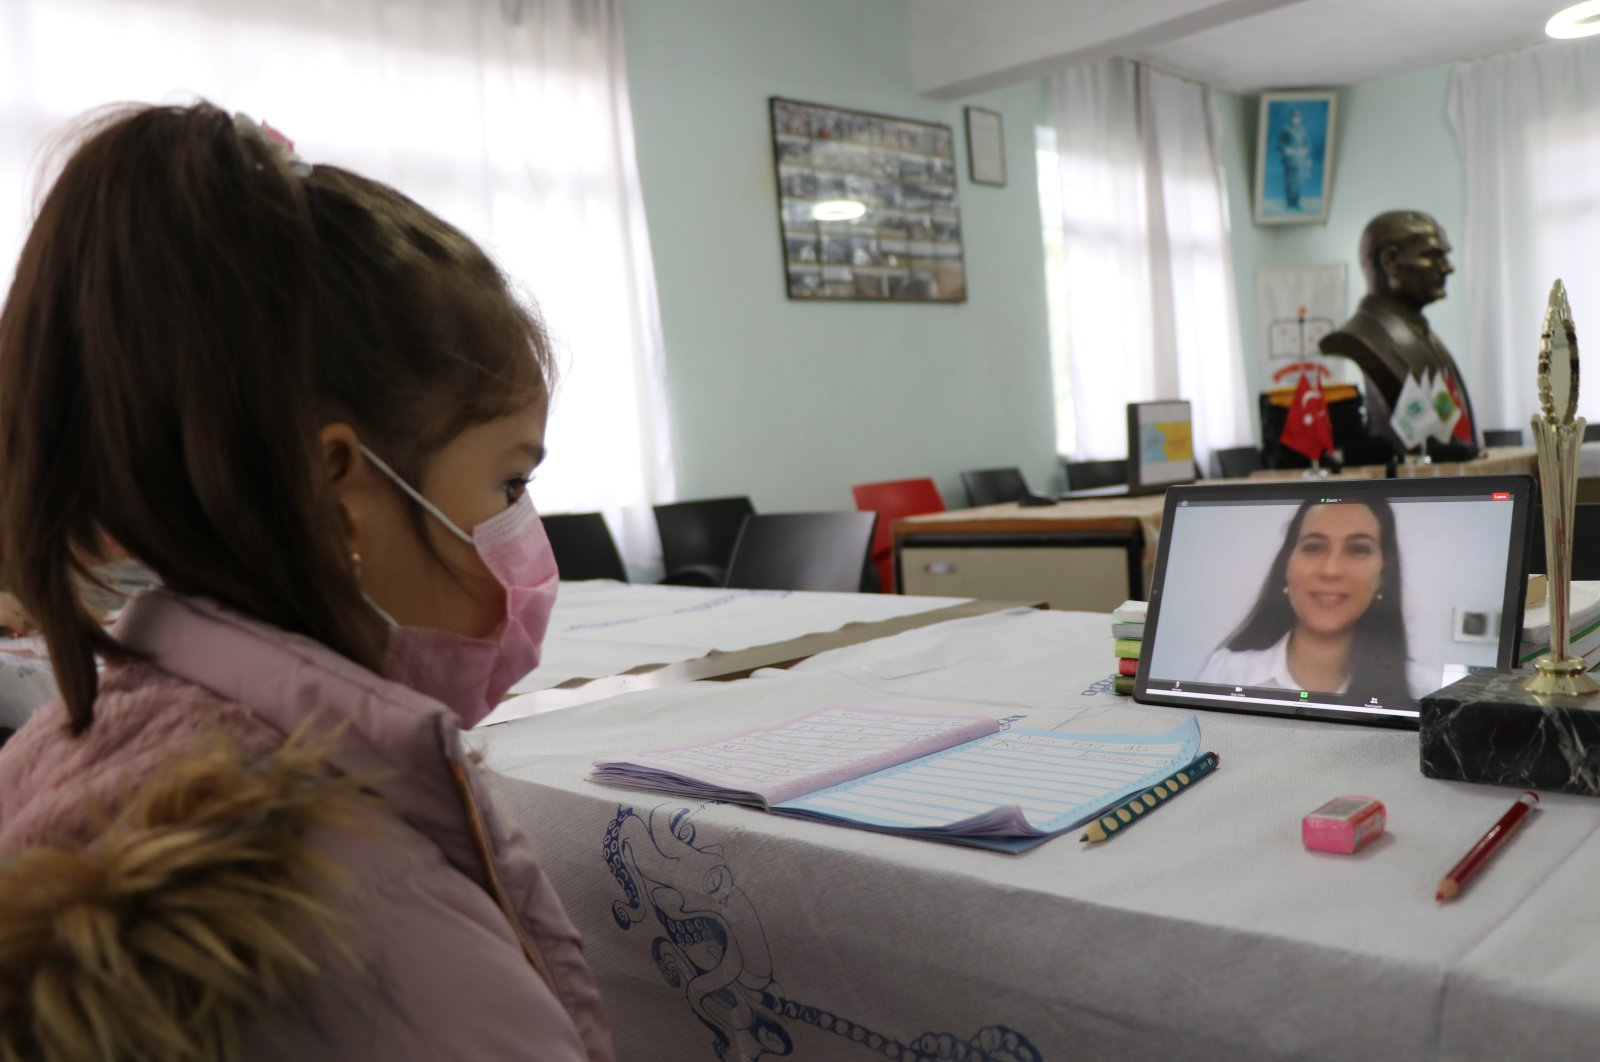 A student attends an online class at an EBA Support Point in Edirne, northwestern Turkey, Jan. 13, 2021. (AA PHOTO)